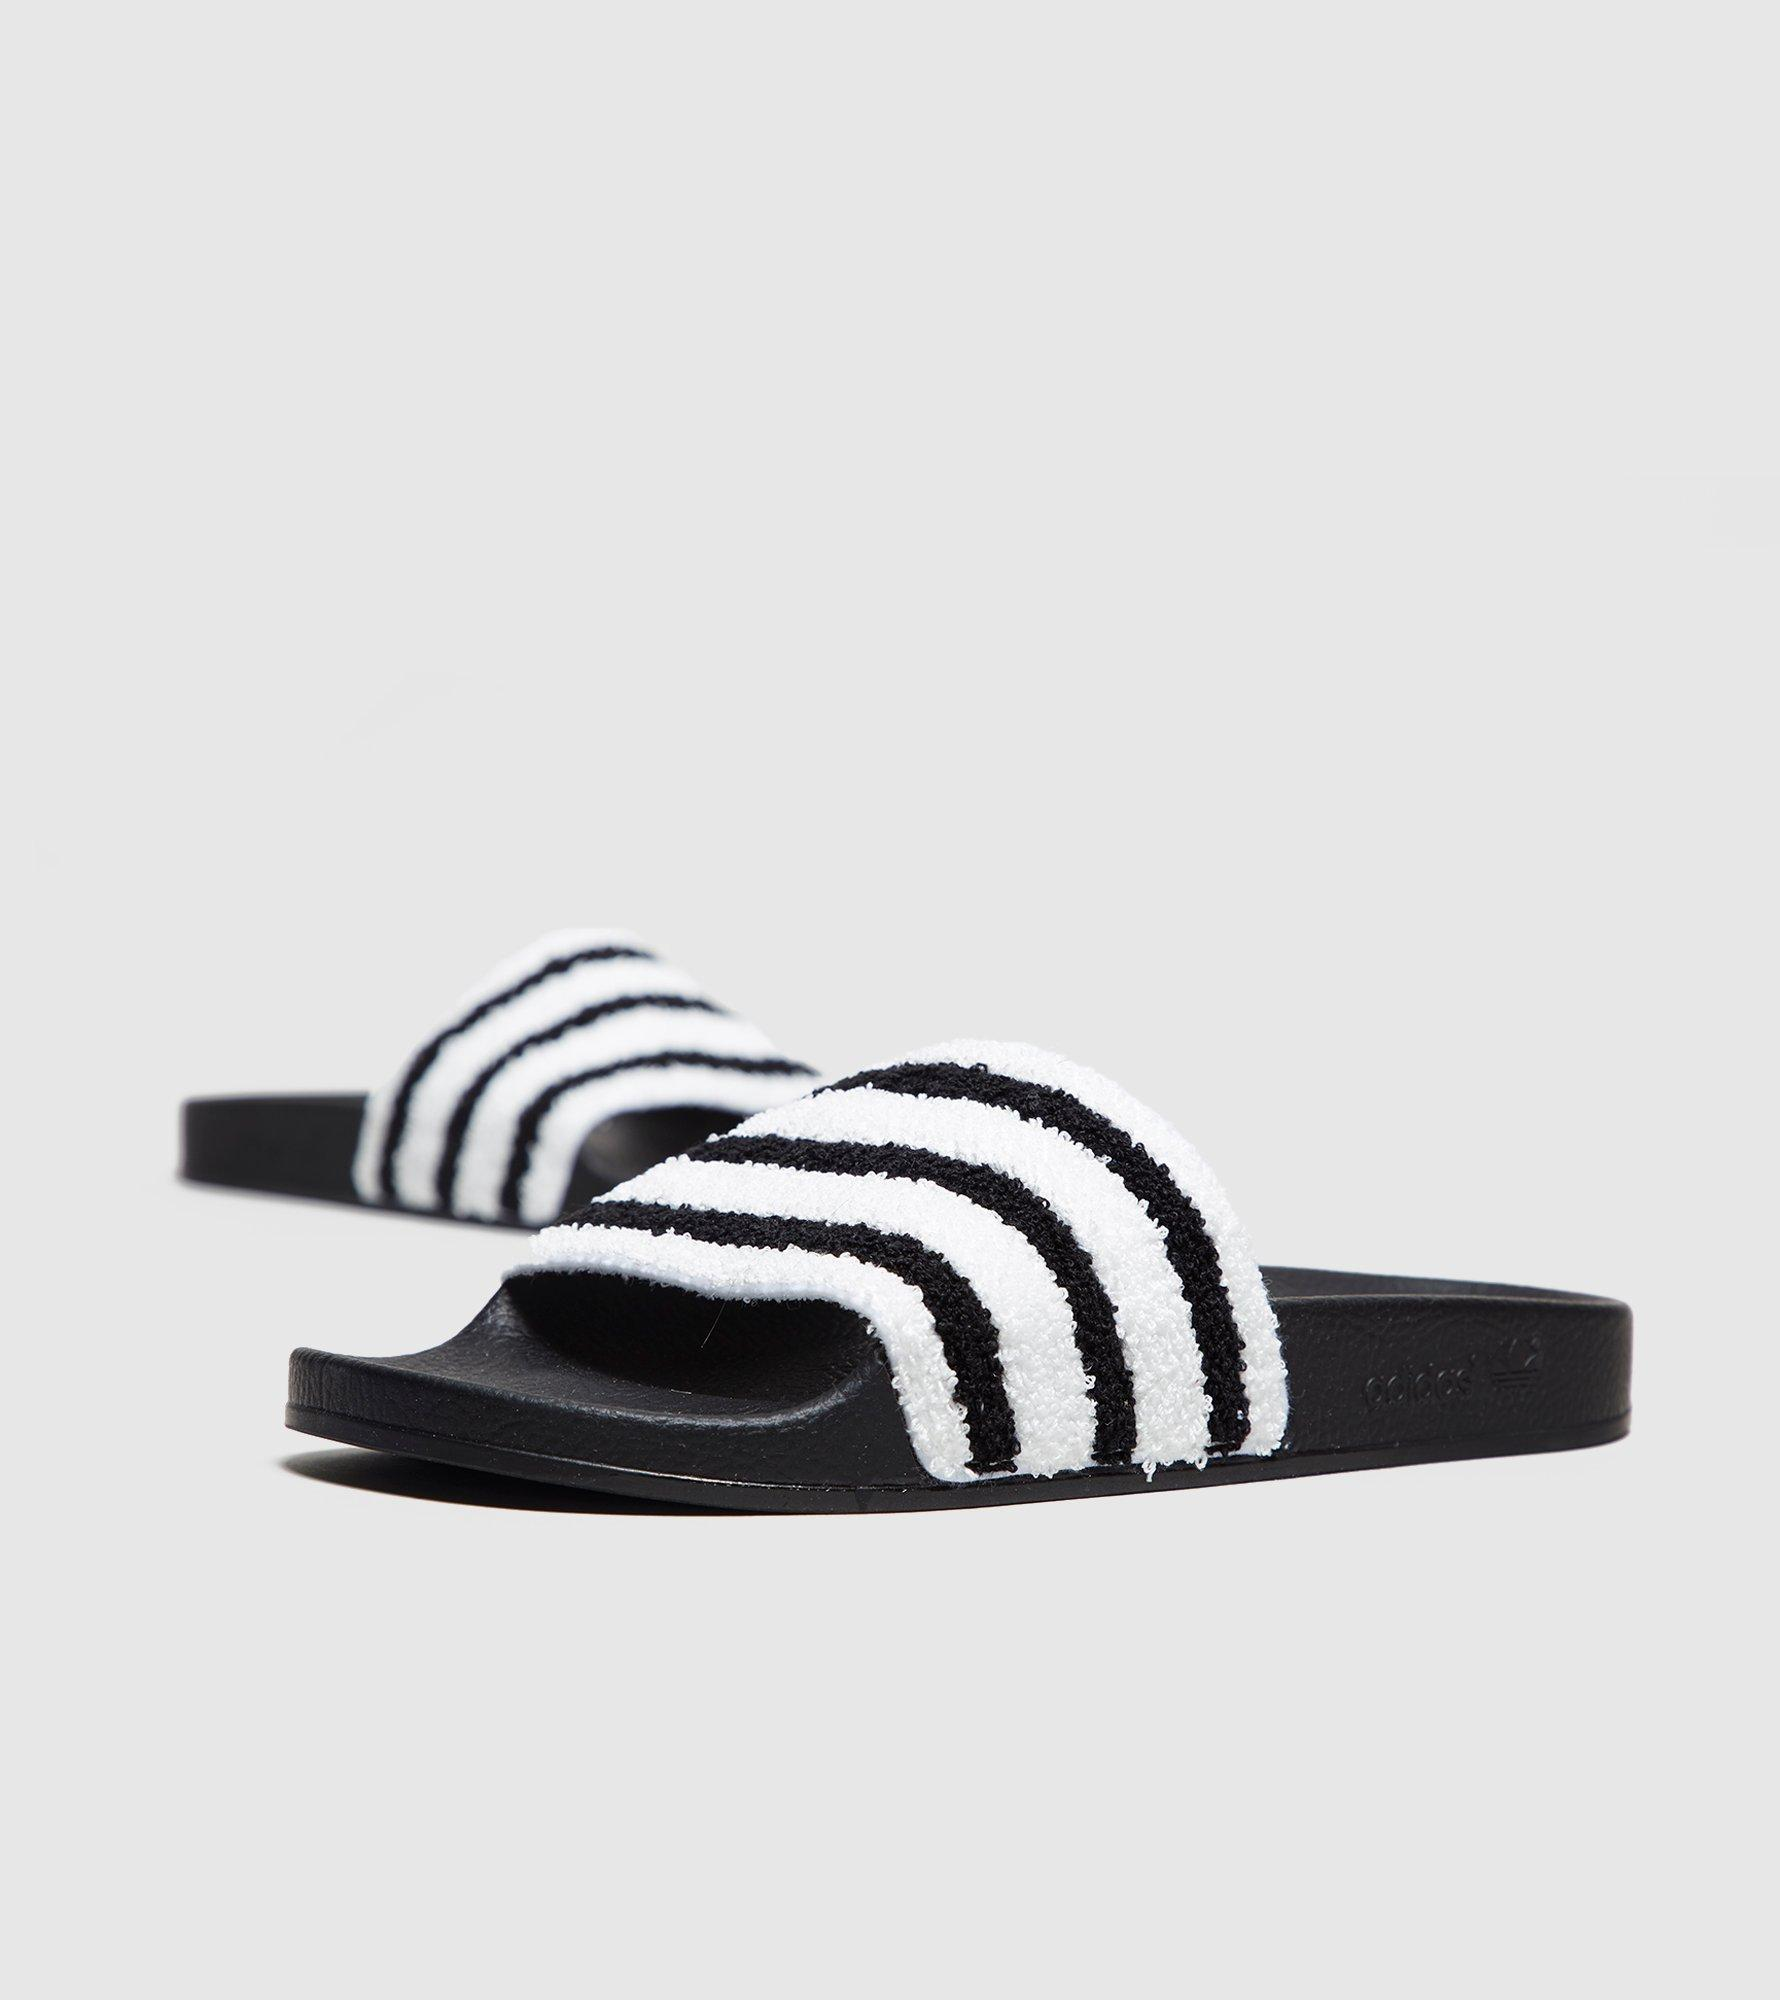 adidas originals adilette slides in black toweling